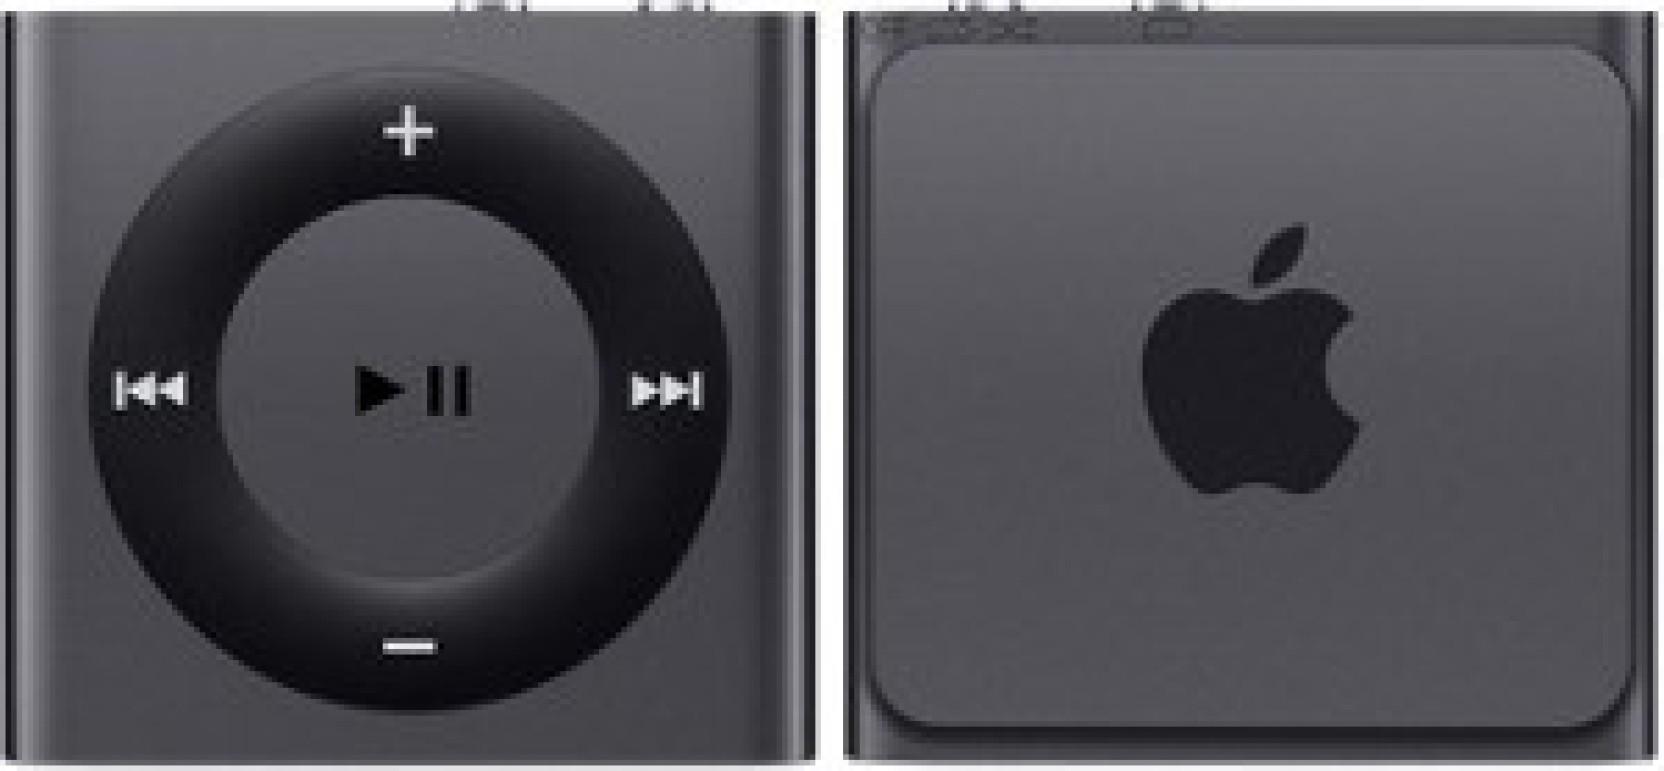 Ipod Access 4.4.1 For Mac